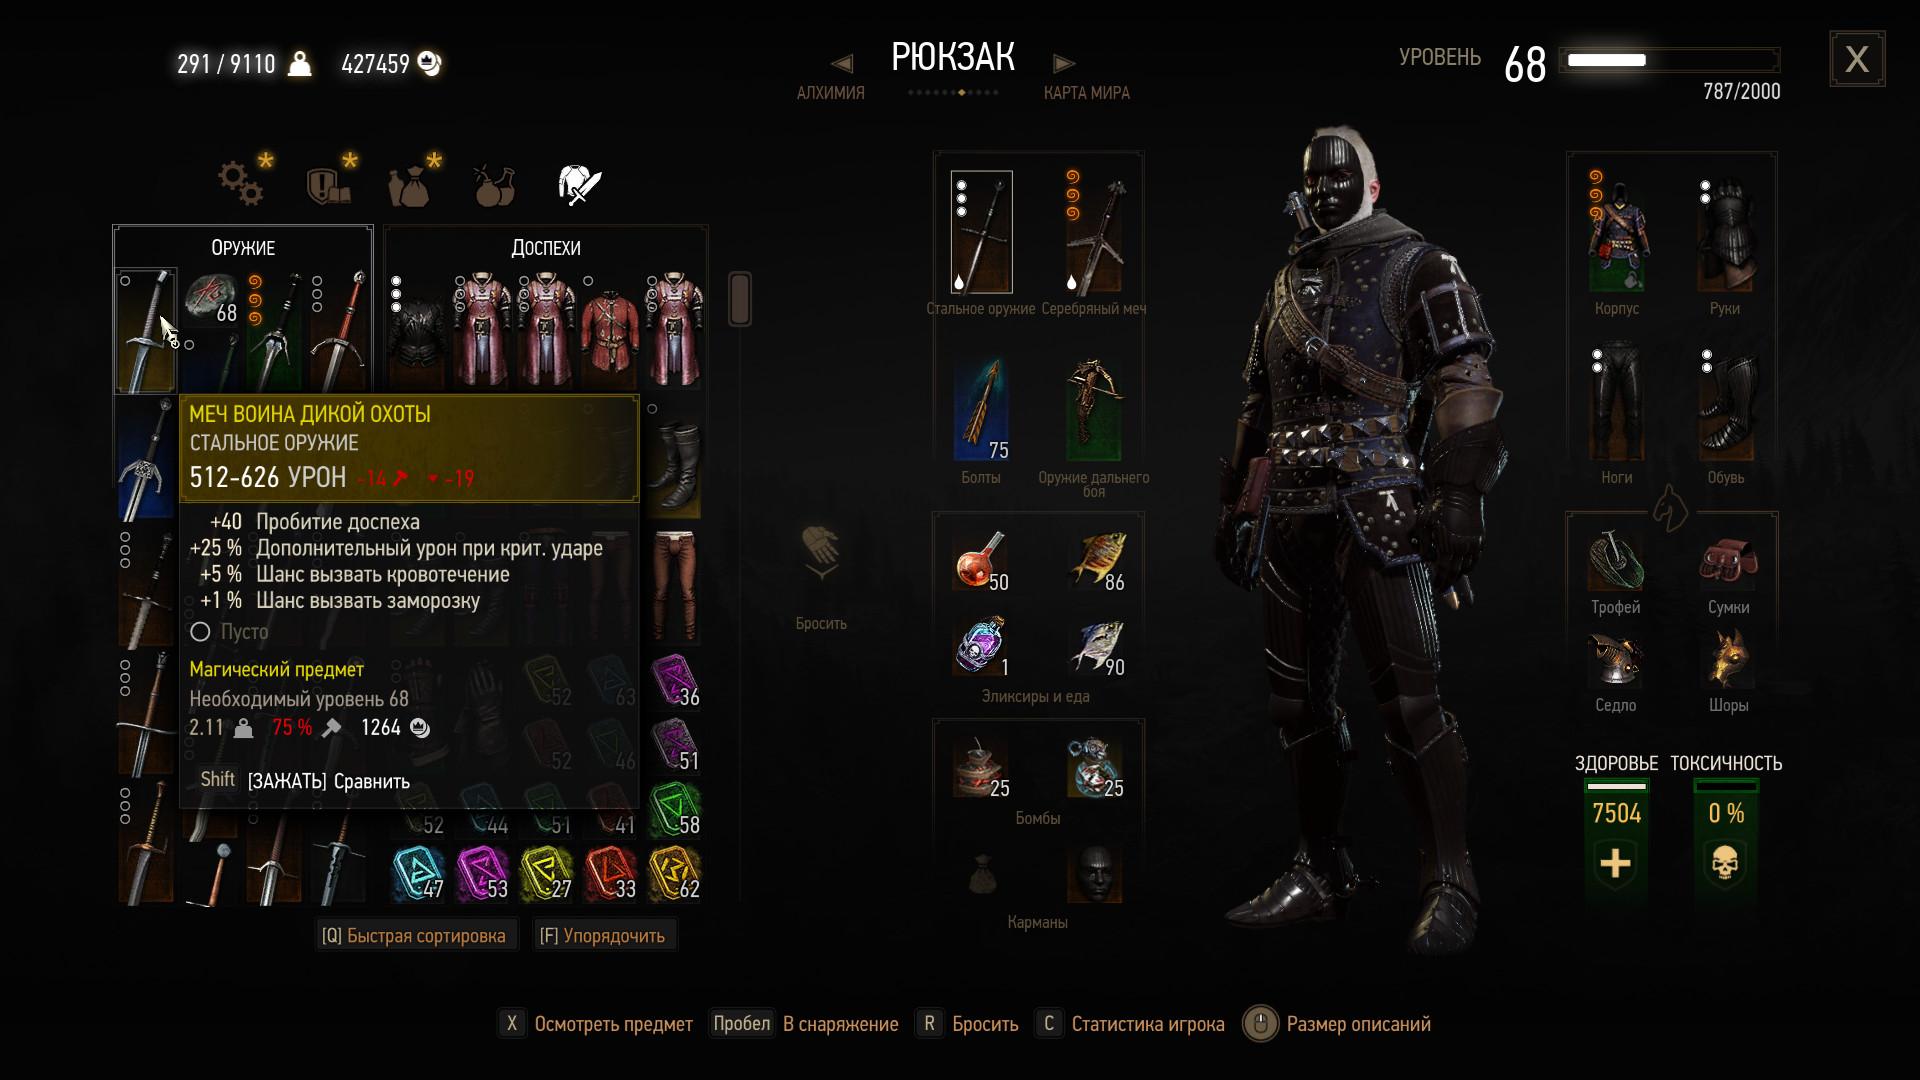 Меч ВДО2.jpg - Witcher 3: Wild Hunt, the